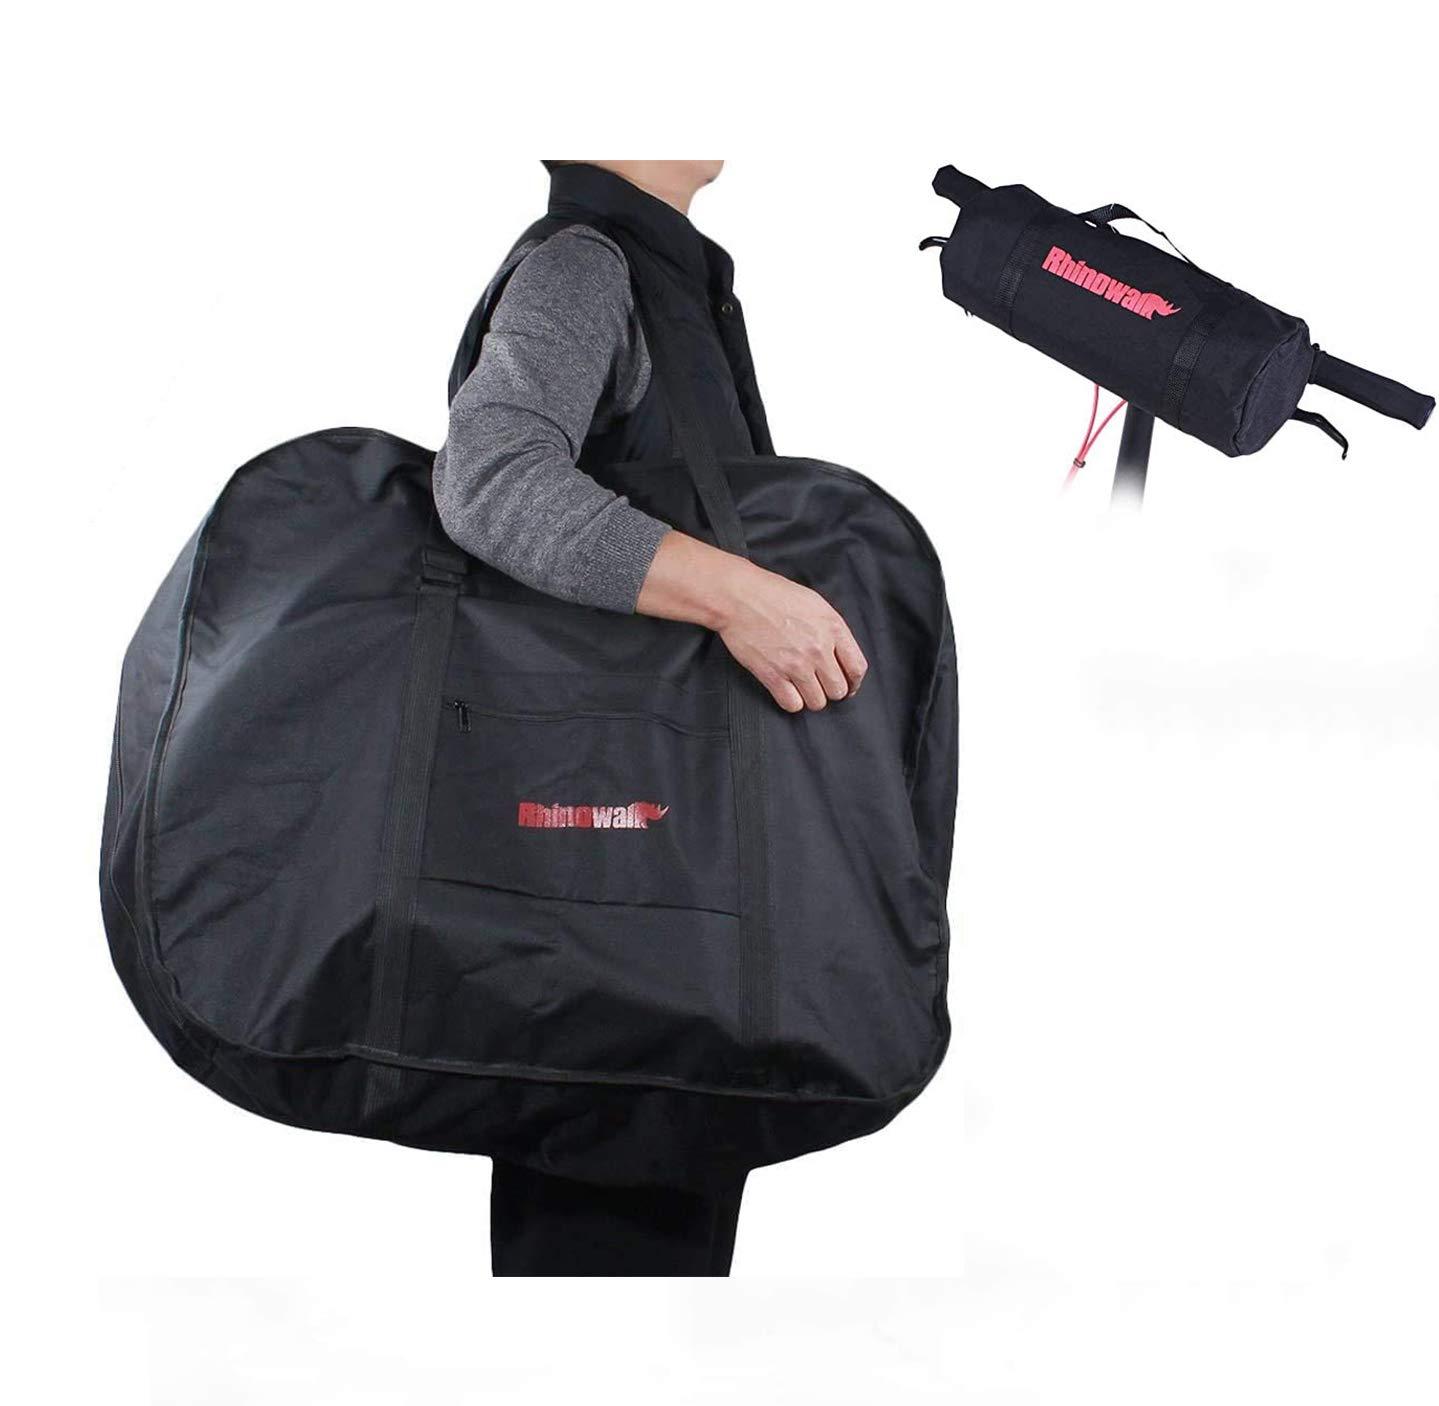 Charwin 20 Inch Folding Bike Bag